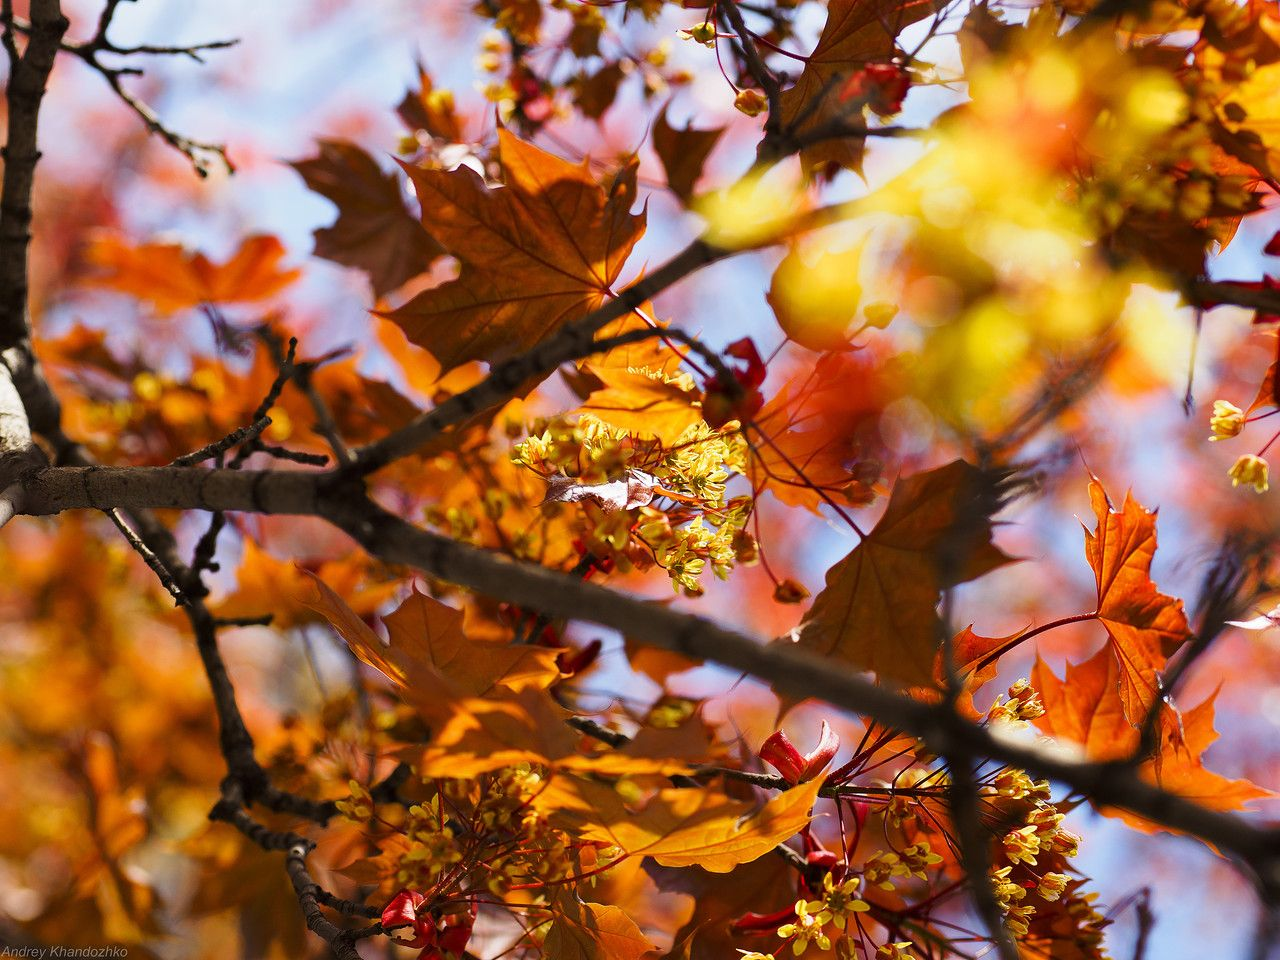 Красивые фотографии / Времена года / ОСЕНЬ http://forum.rise-n-fall.com/showthread.php?t=2207&page=18